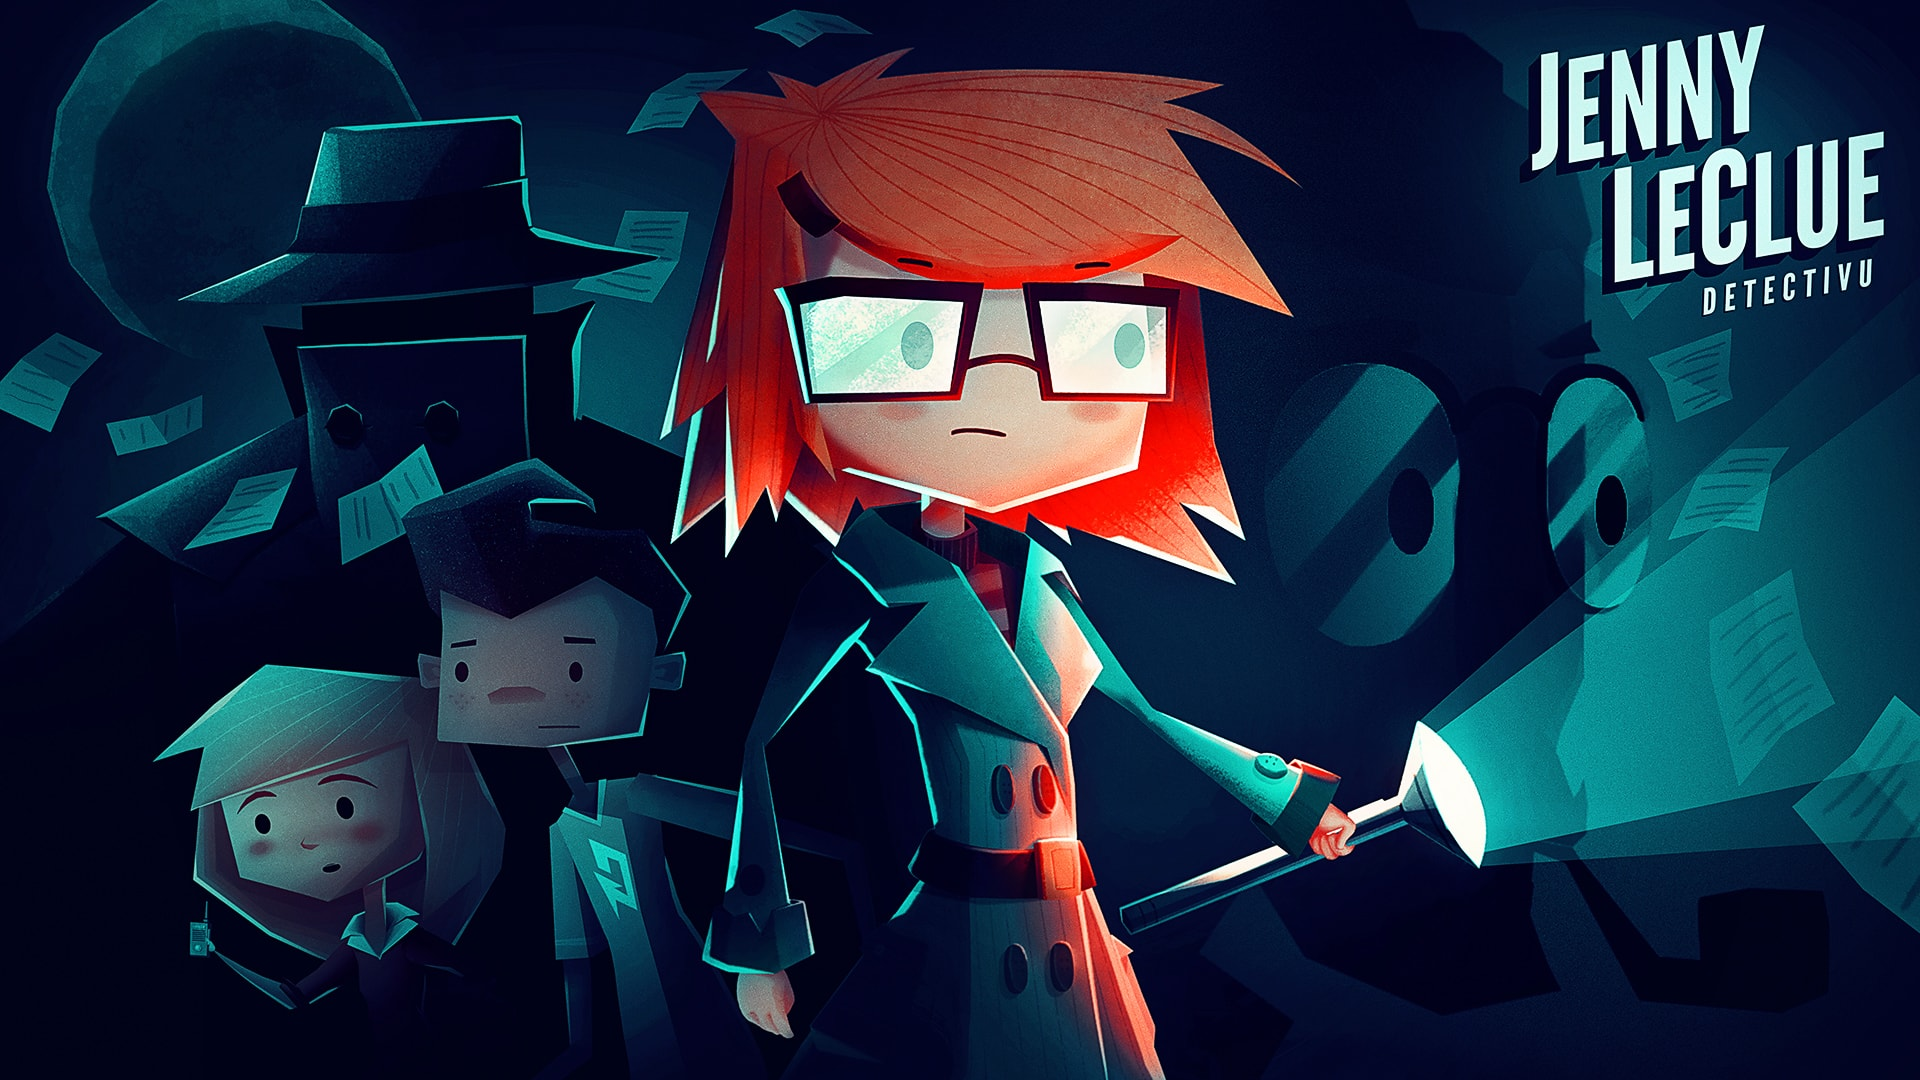 Jenny LeClue - Detectivu (Nintendo Switch Digital Download) $2.99 via Nintendo eShop